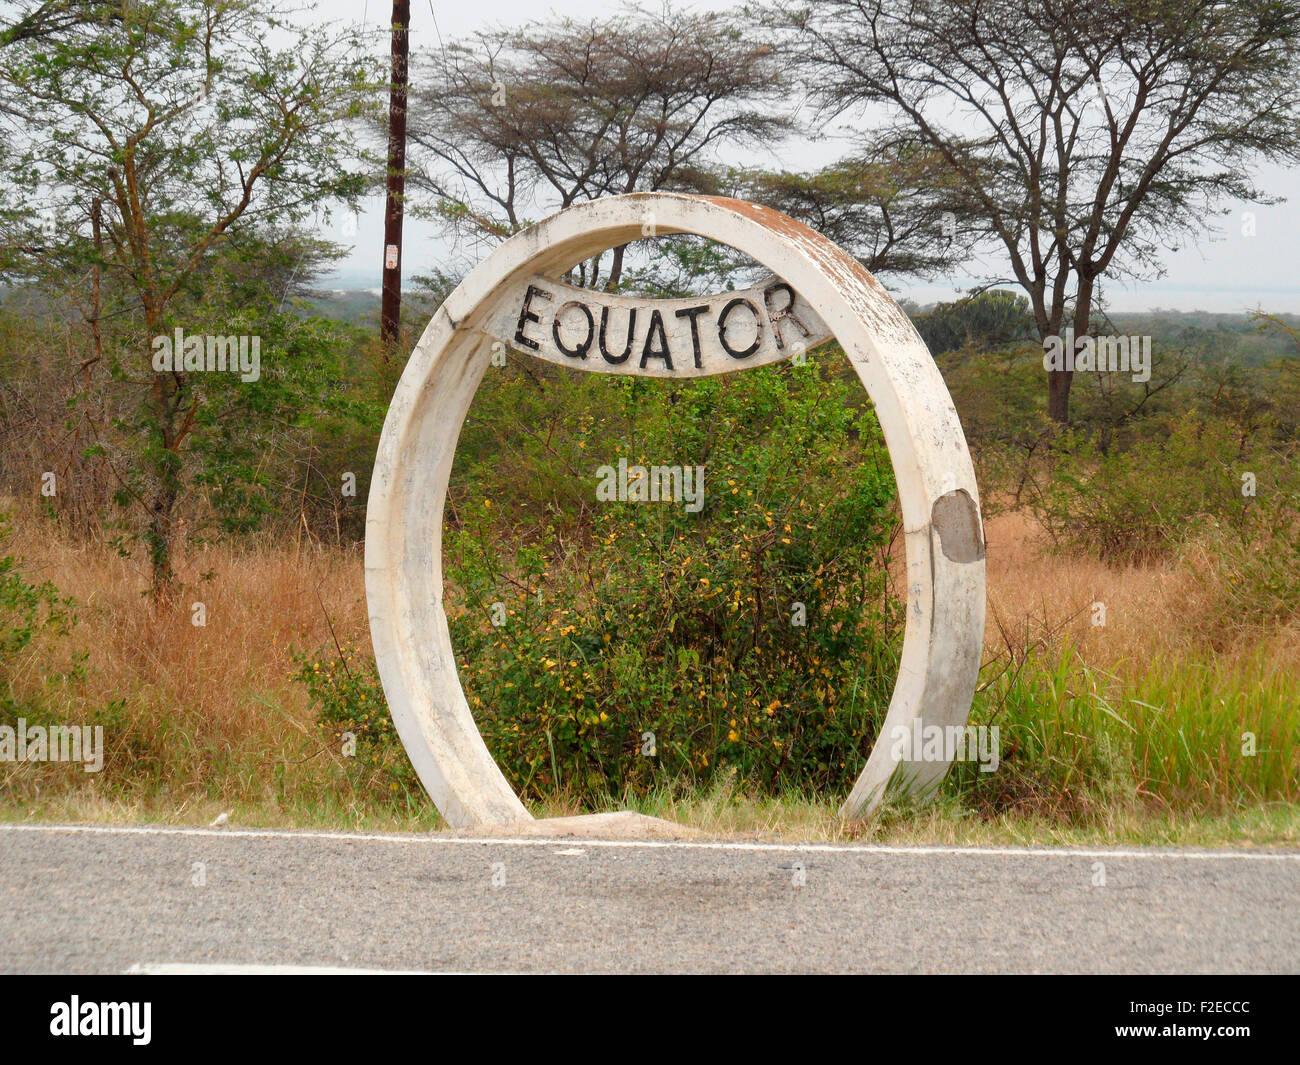 Aequator, Uganda. Imagen De Stock